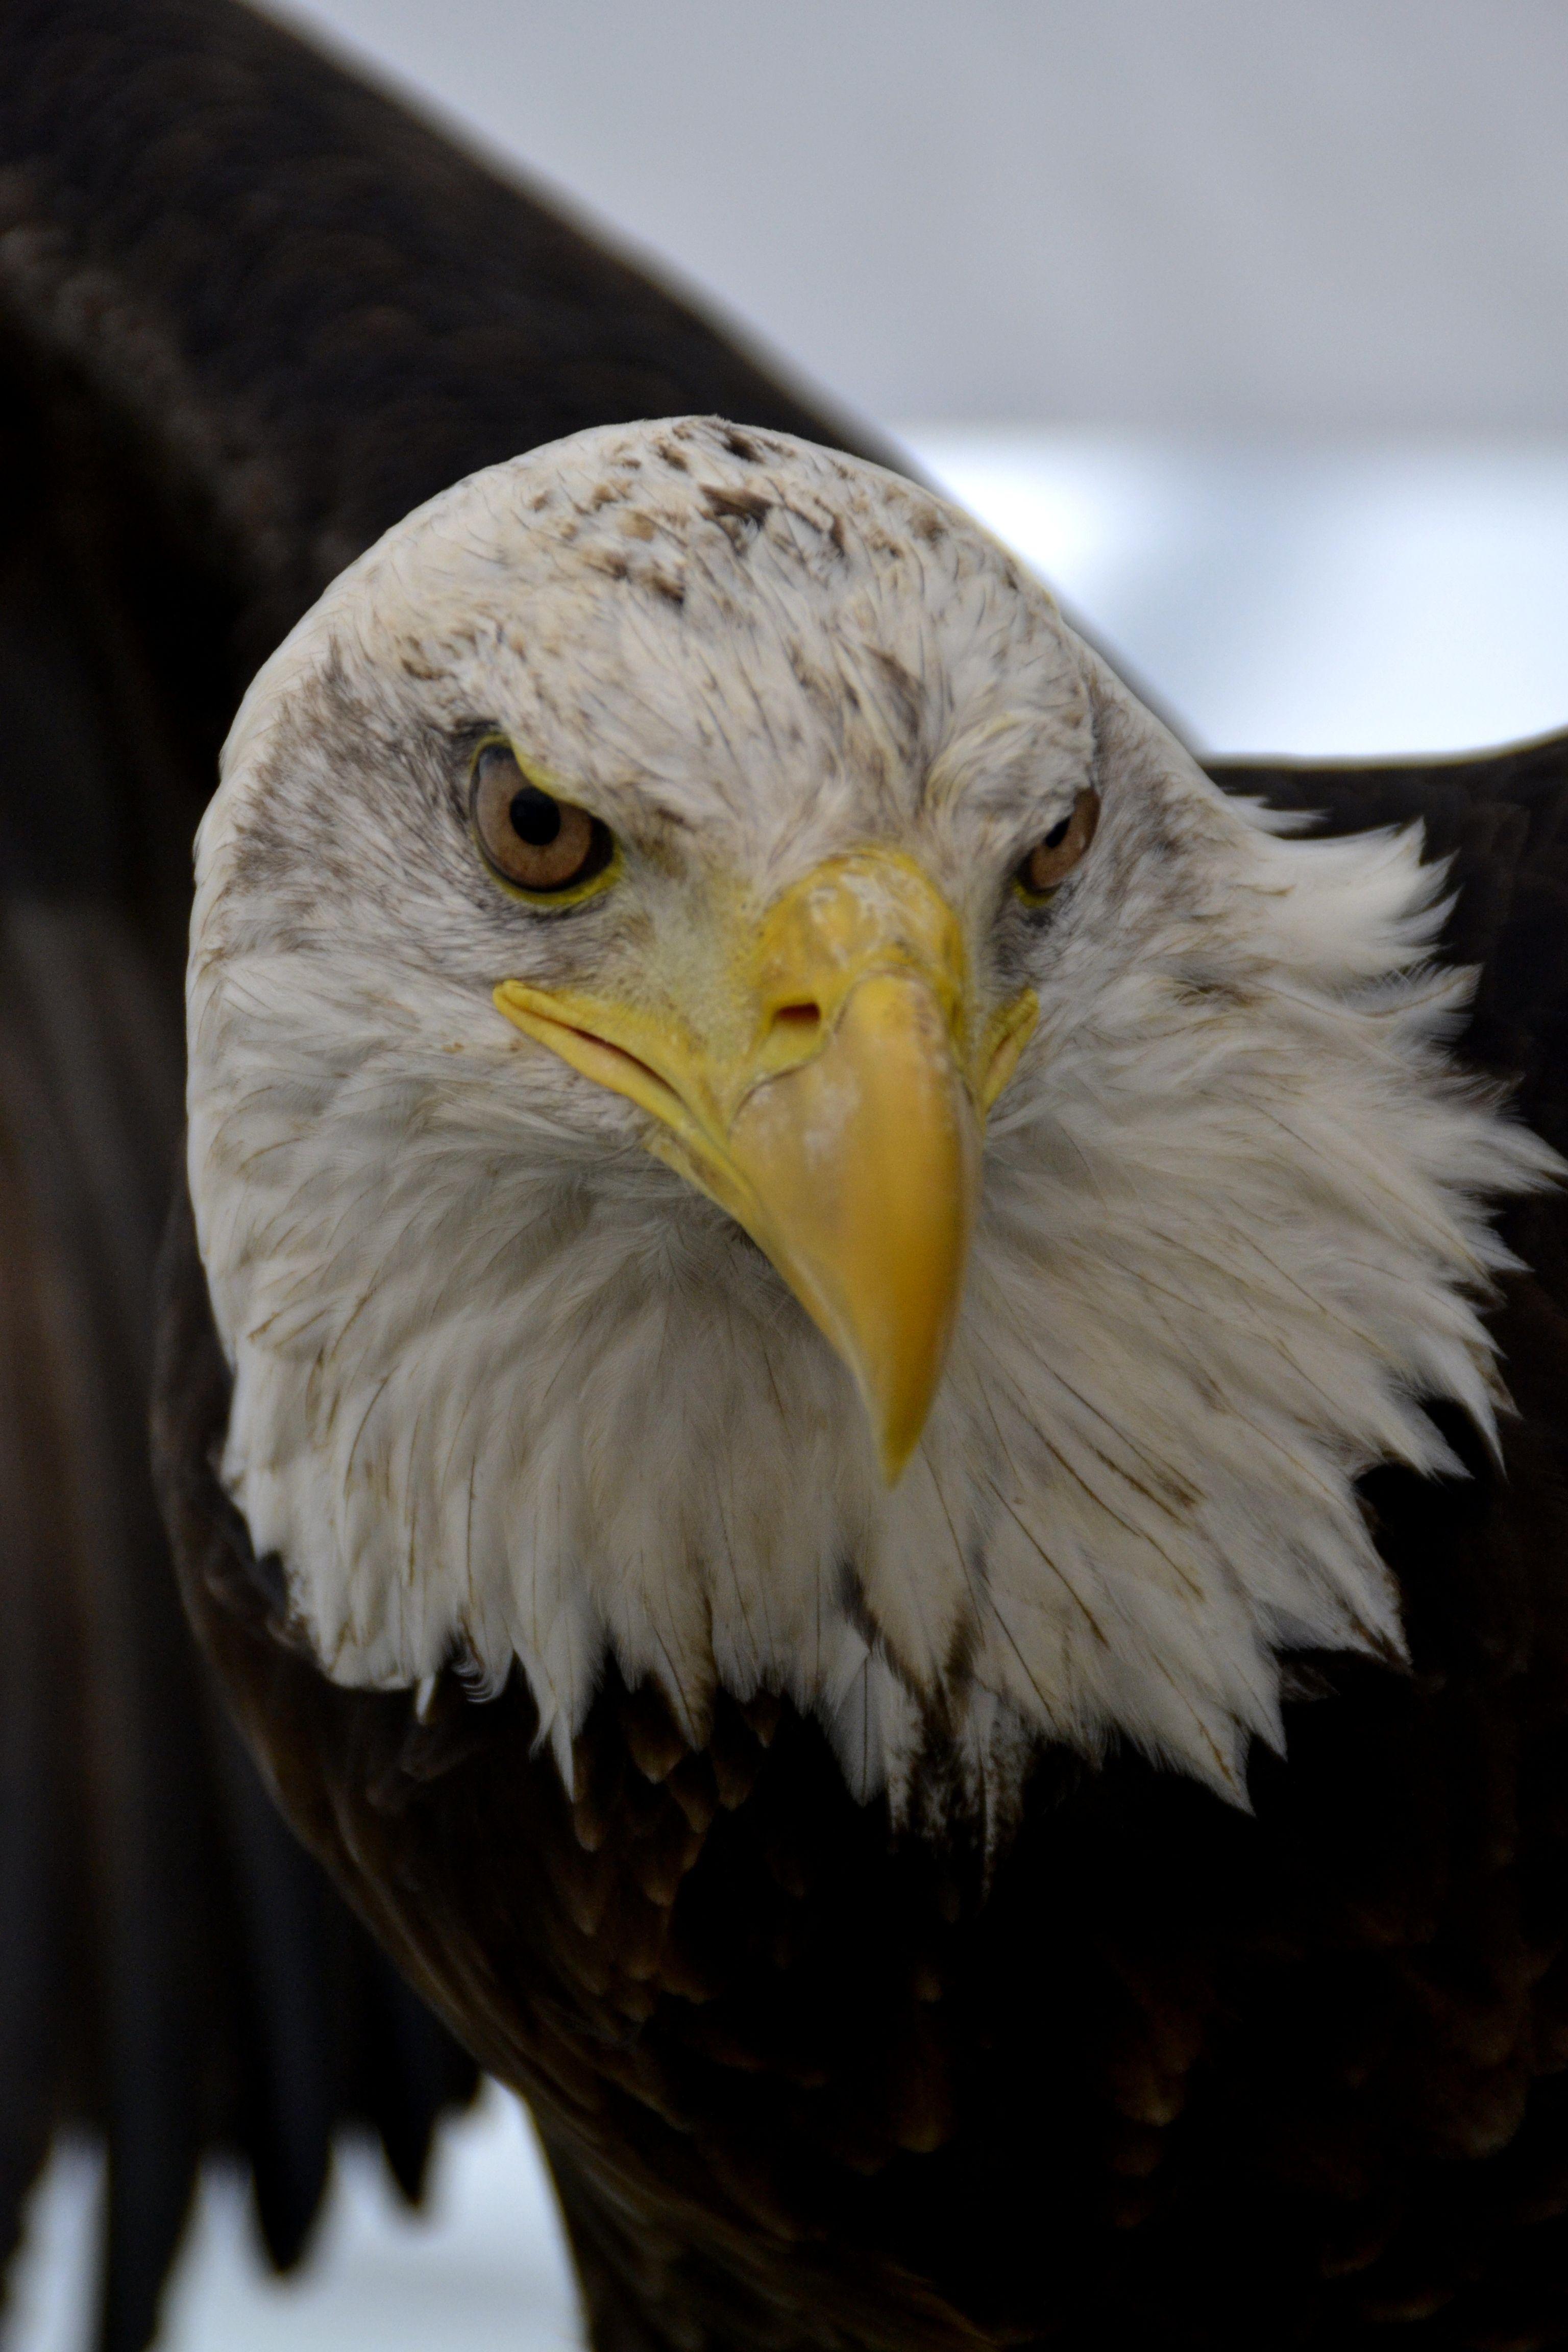 Eagle at Devon, County Show, Devon, UK